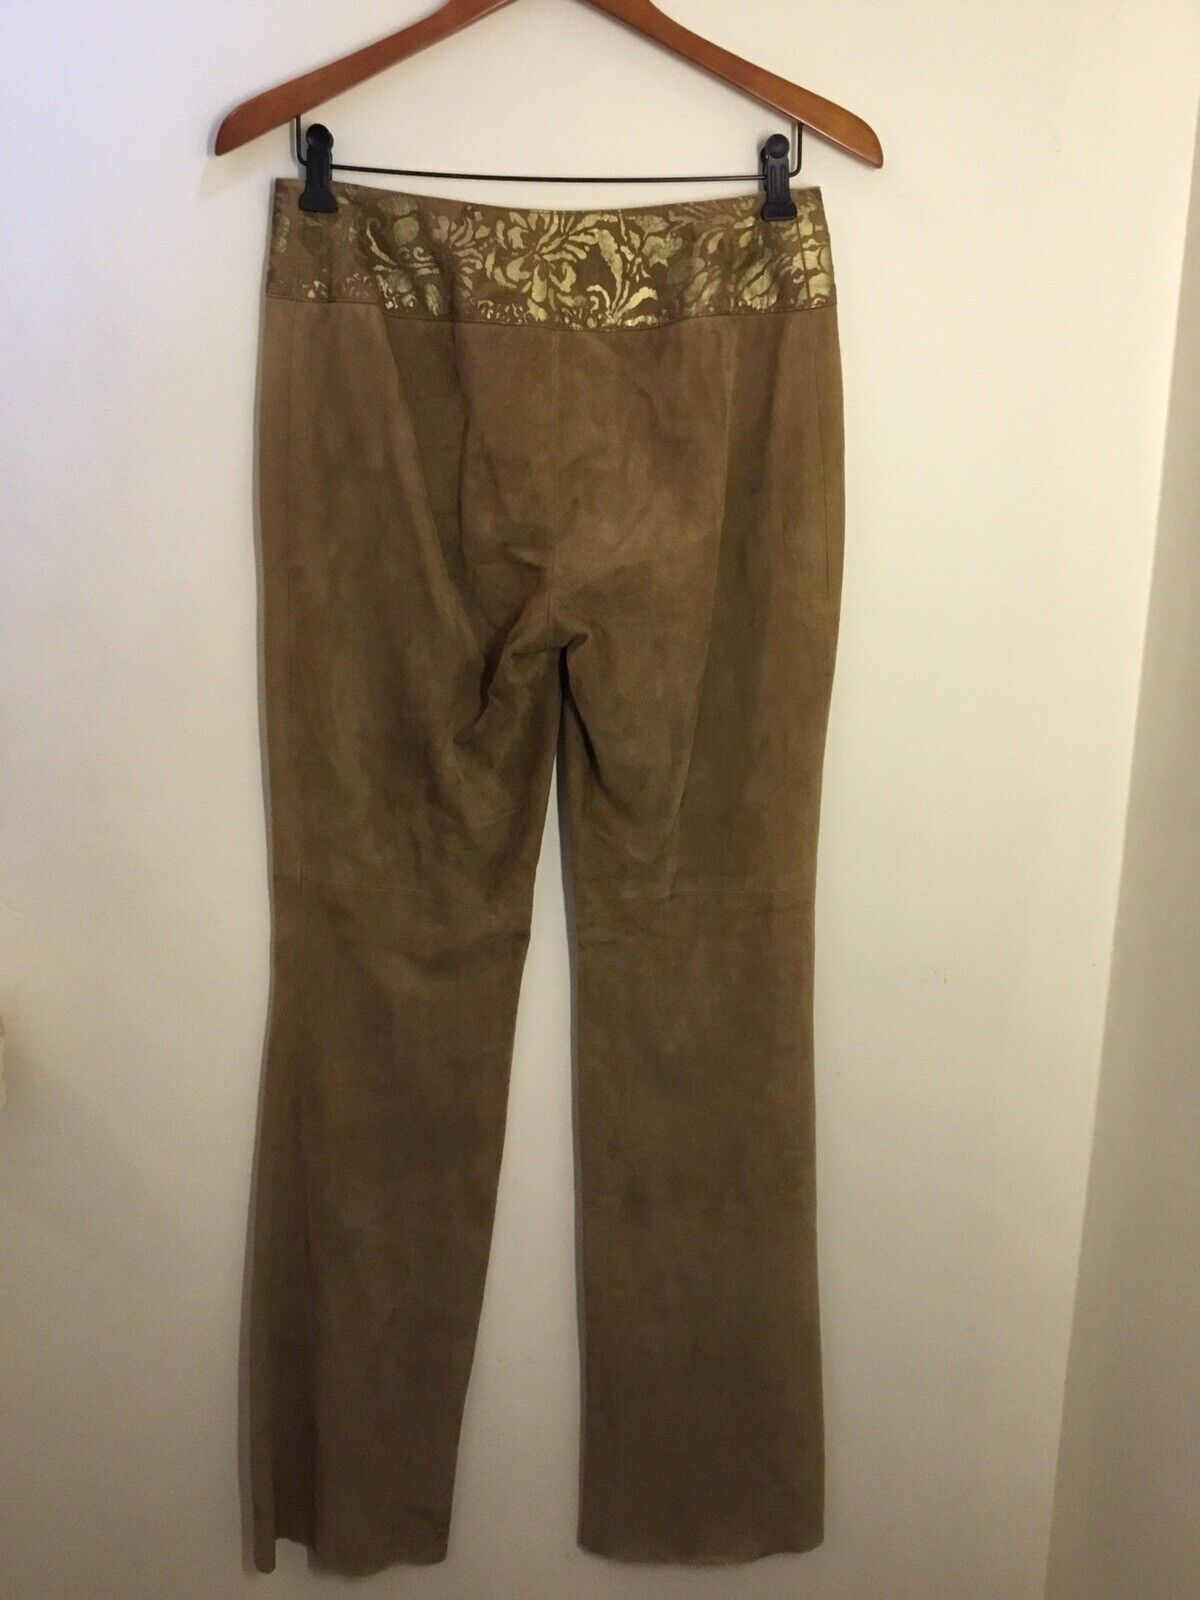 Ralph Lauren Black Label Gold Painted Brown Suede… - image 2